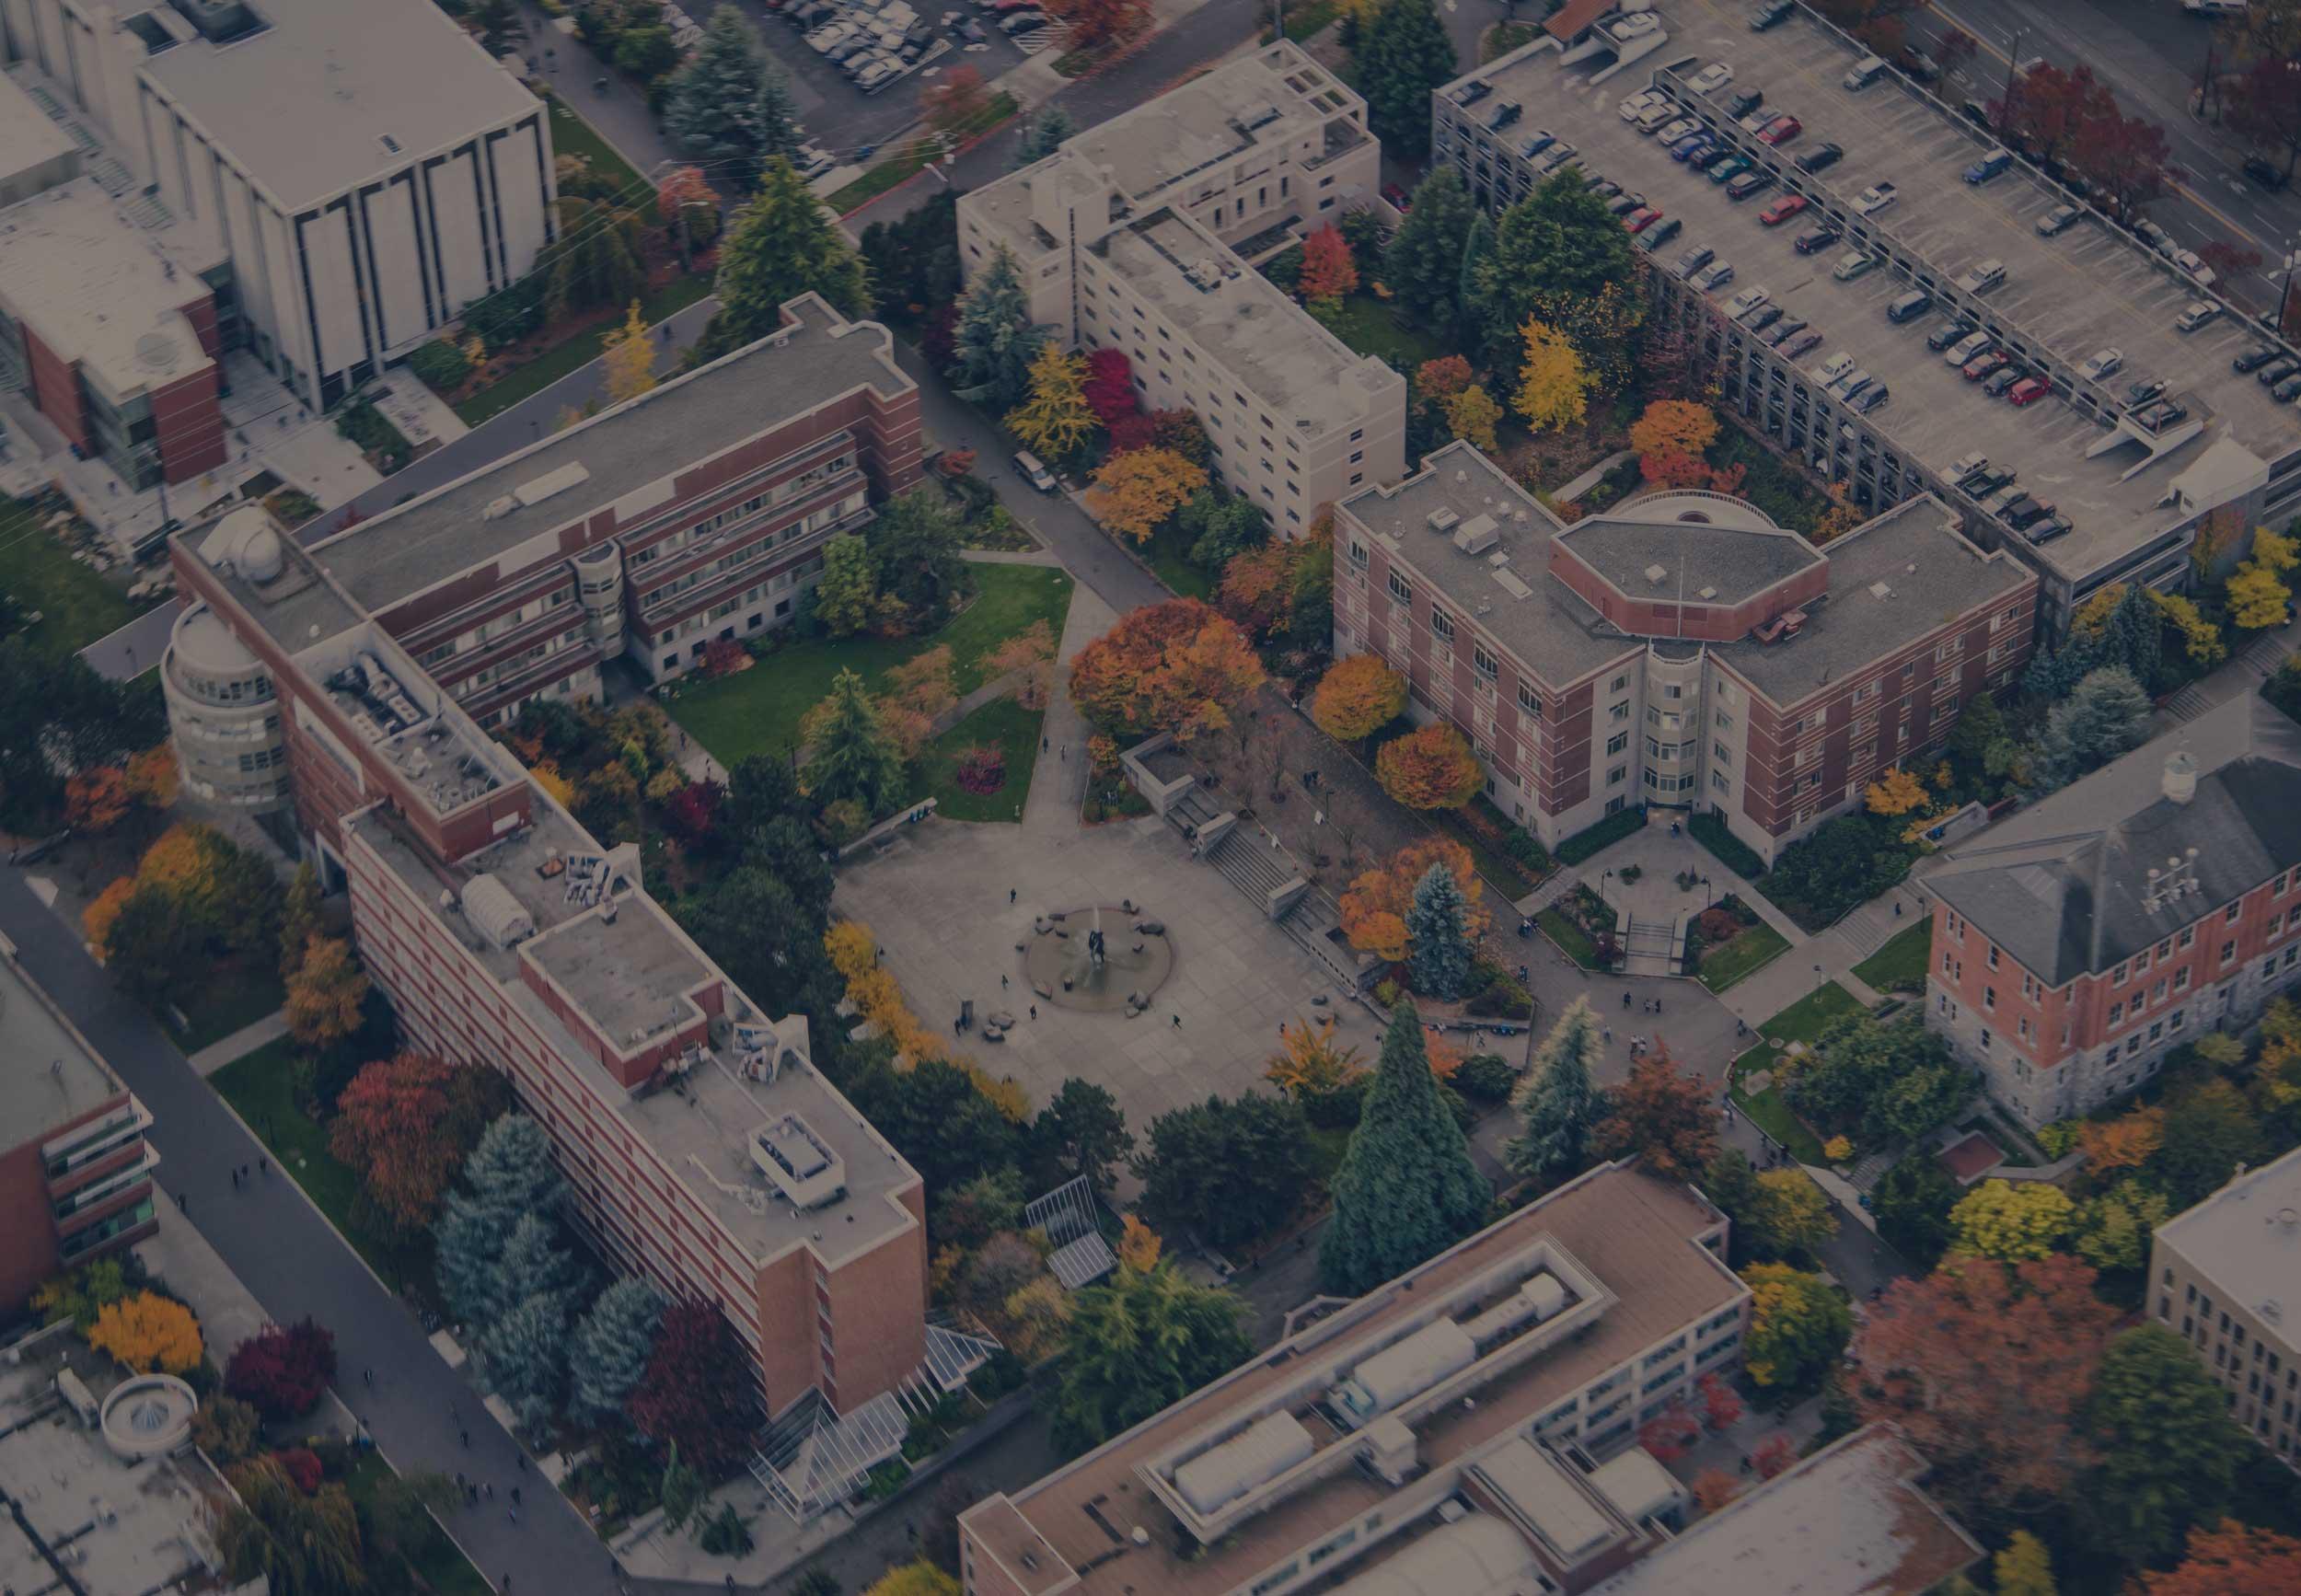 School Wireless Network Design 2.0 – 10 Campus Wi-Fi Planning Tips